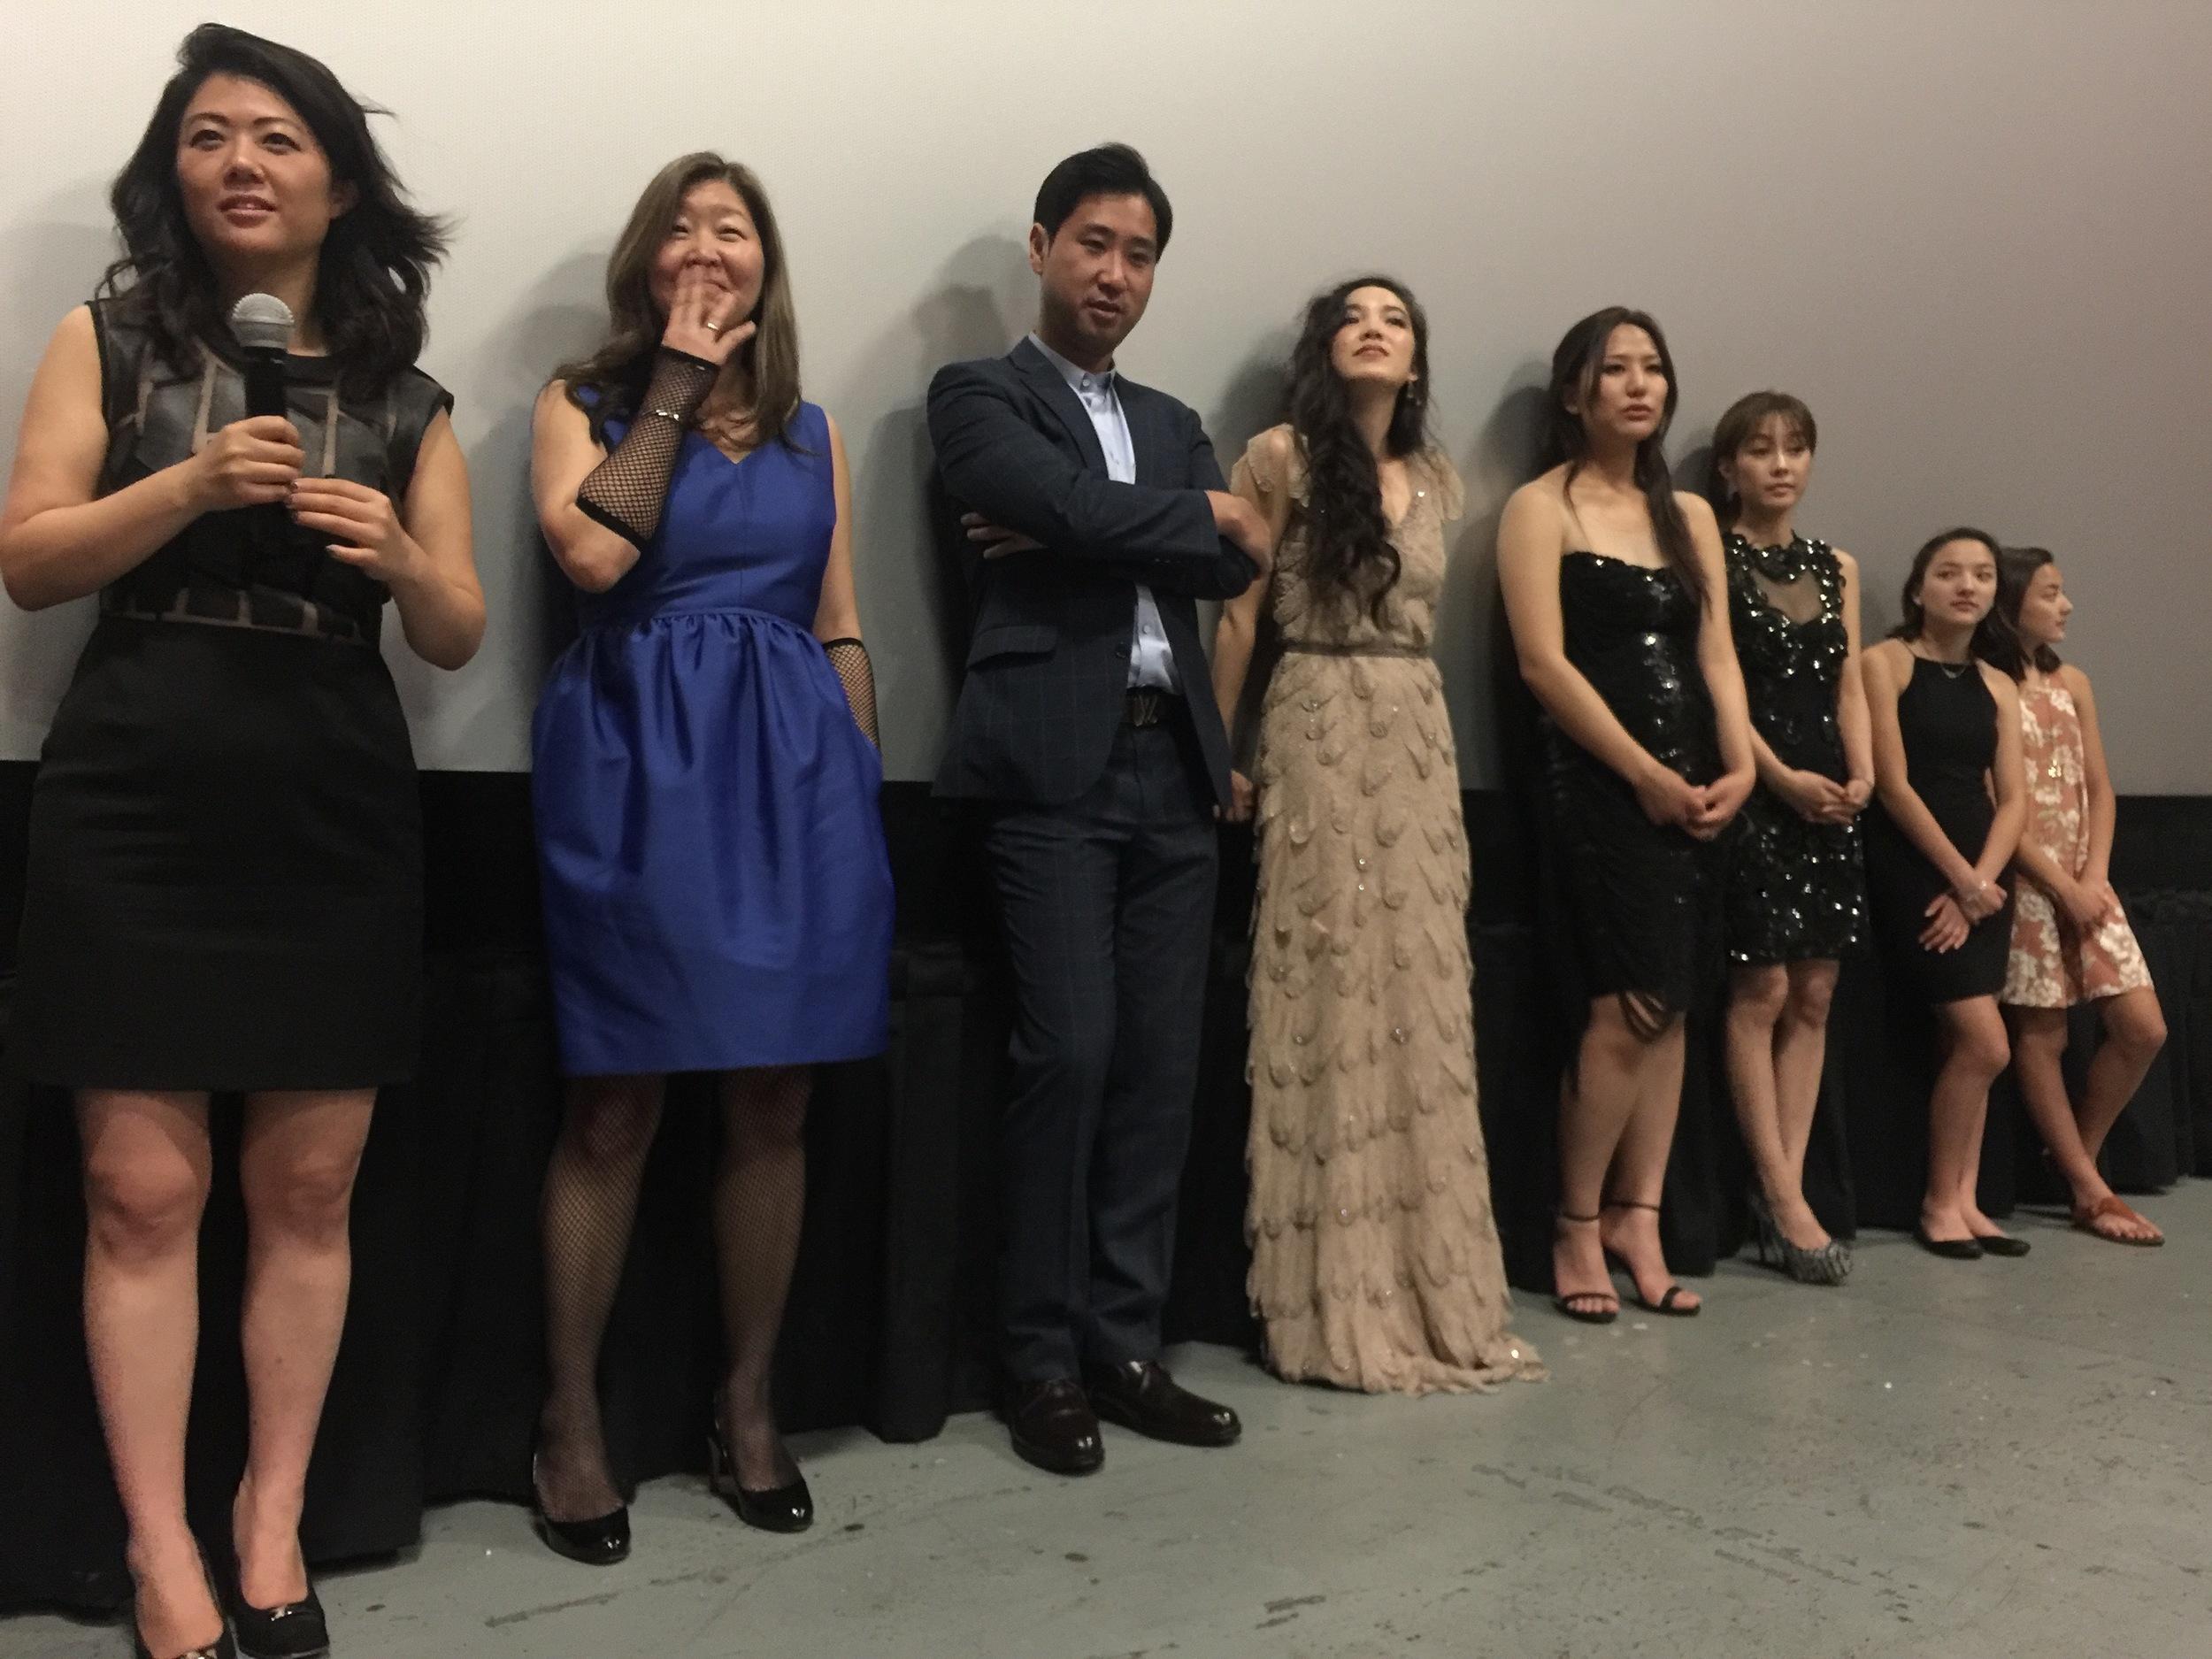 Q & A after the premier; Producer Andrea Chung, Executive producer Bj Noh, Cast Esteban Ahn, Jessika Van, Rosalina Leigh, Sue Son, Nekhebet & Uatchet Juch.